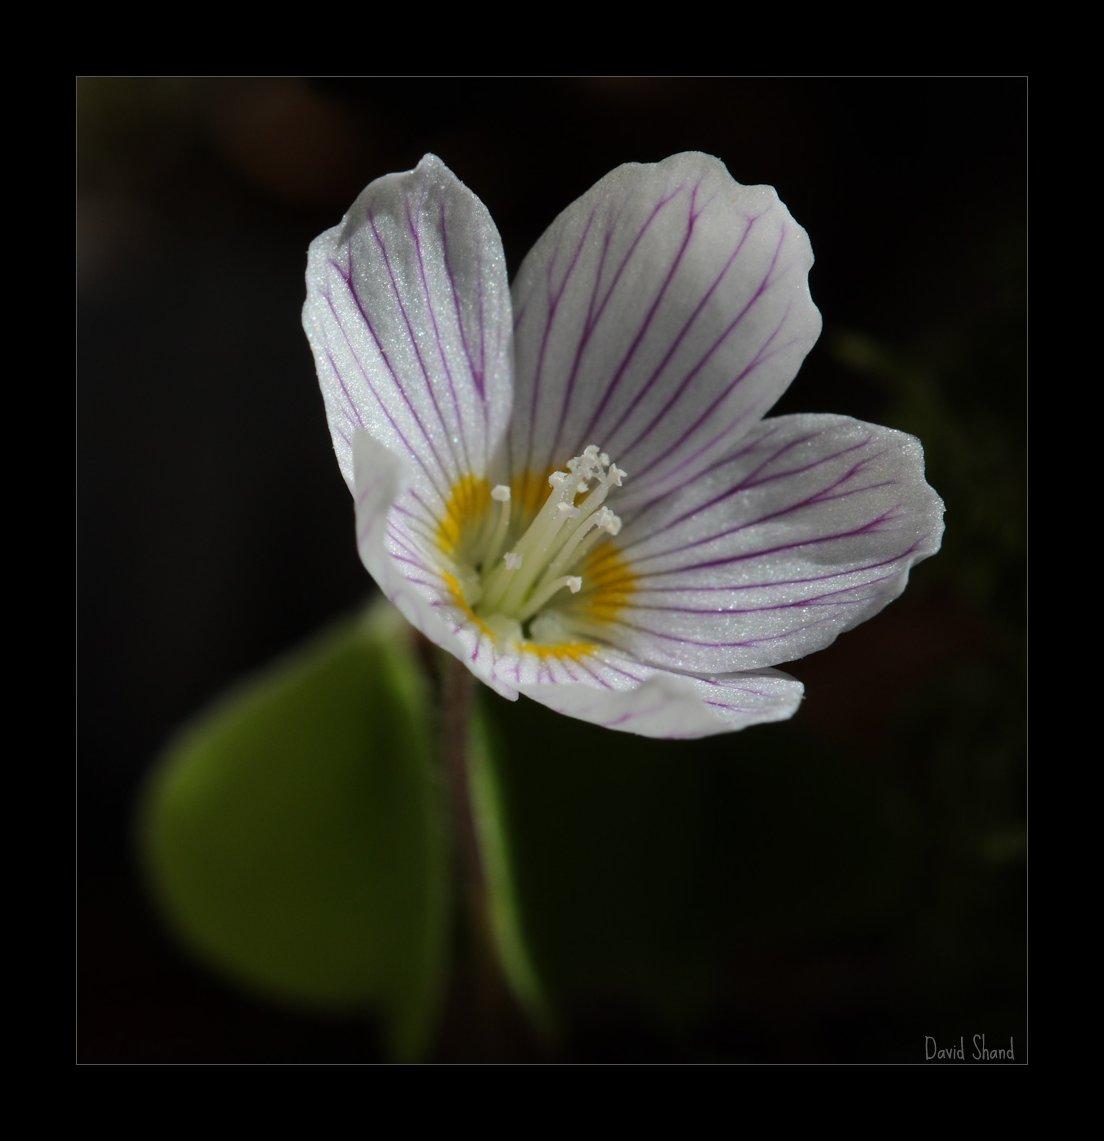 Wood-sorrel, Oxalis acetasella